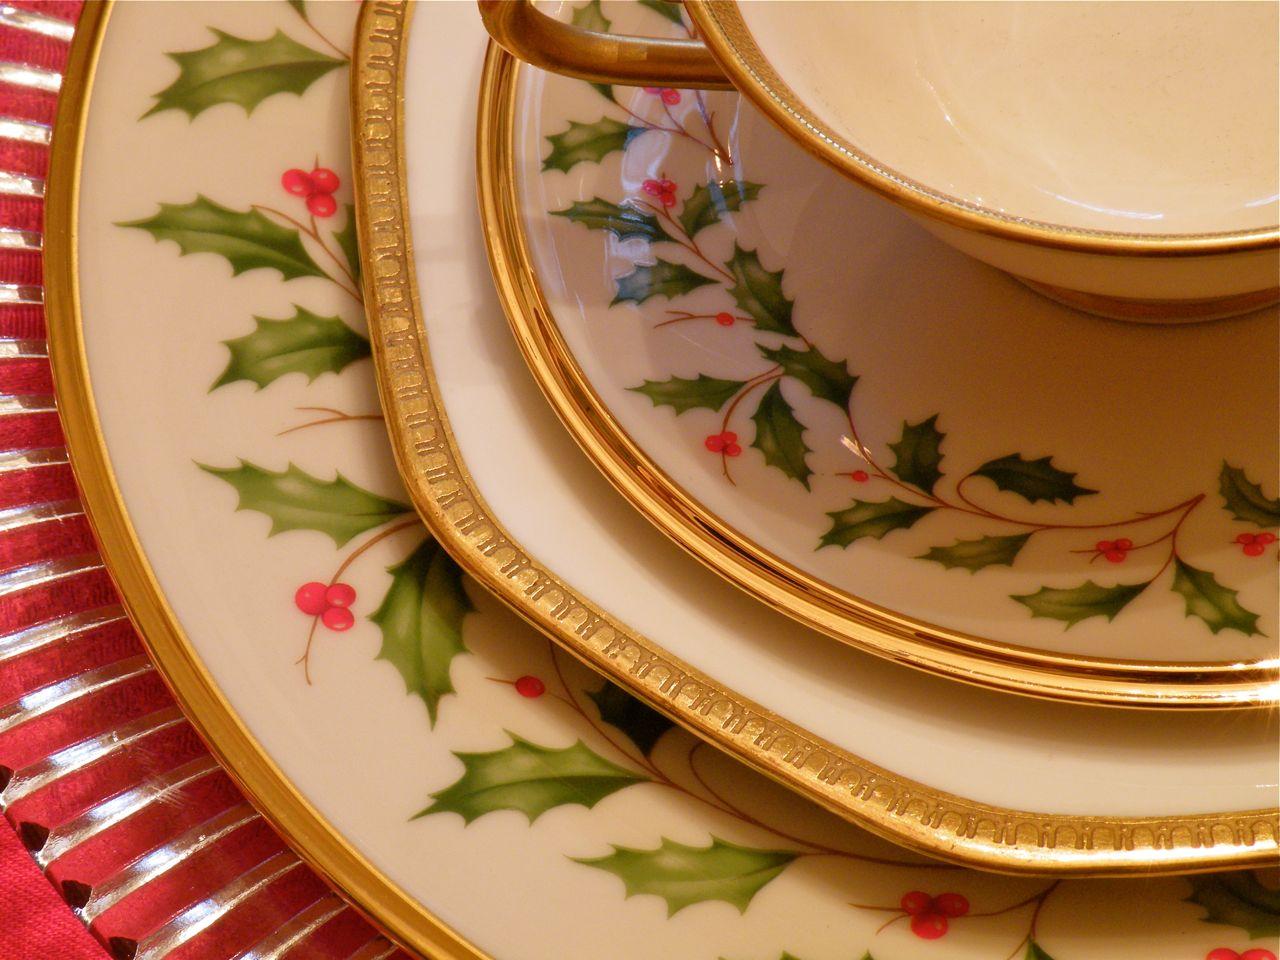 Seasonal Simplicity A Lenox Holiday Tablescape & Lenox Holiday Dinnerware - Castrophotos